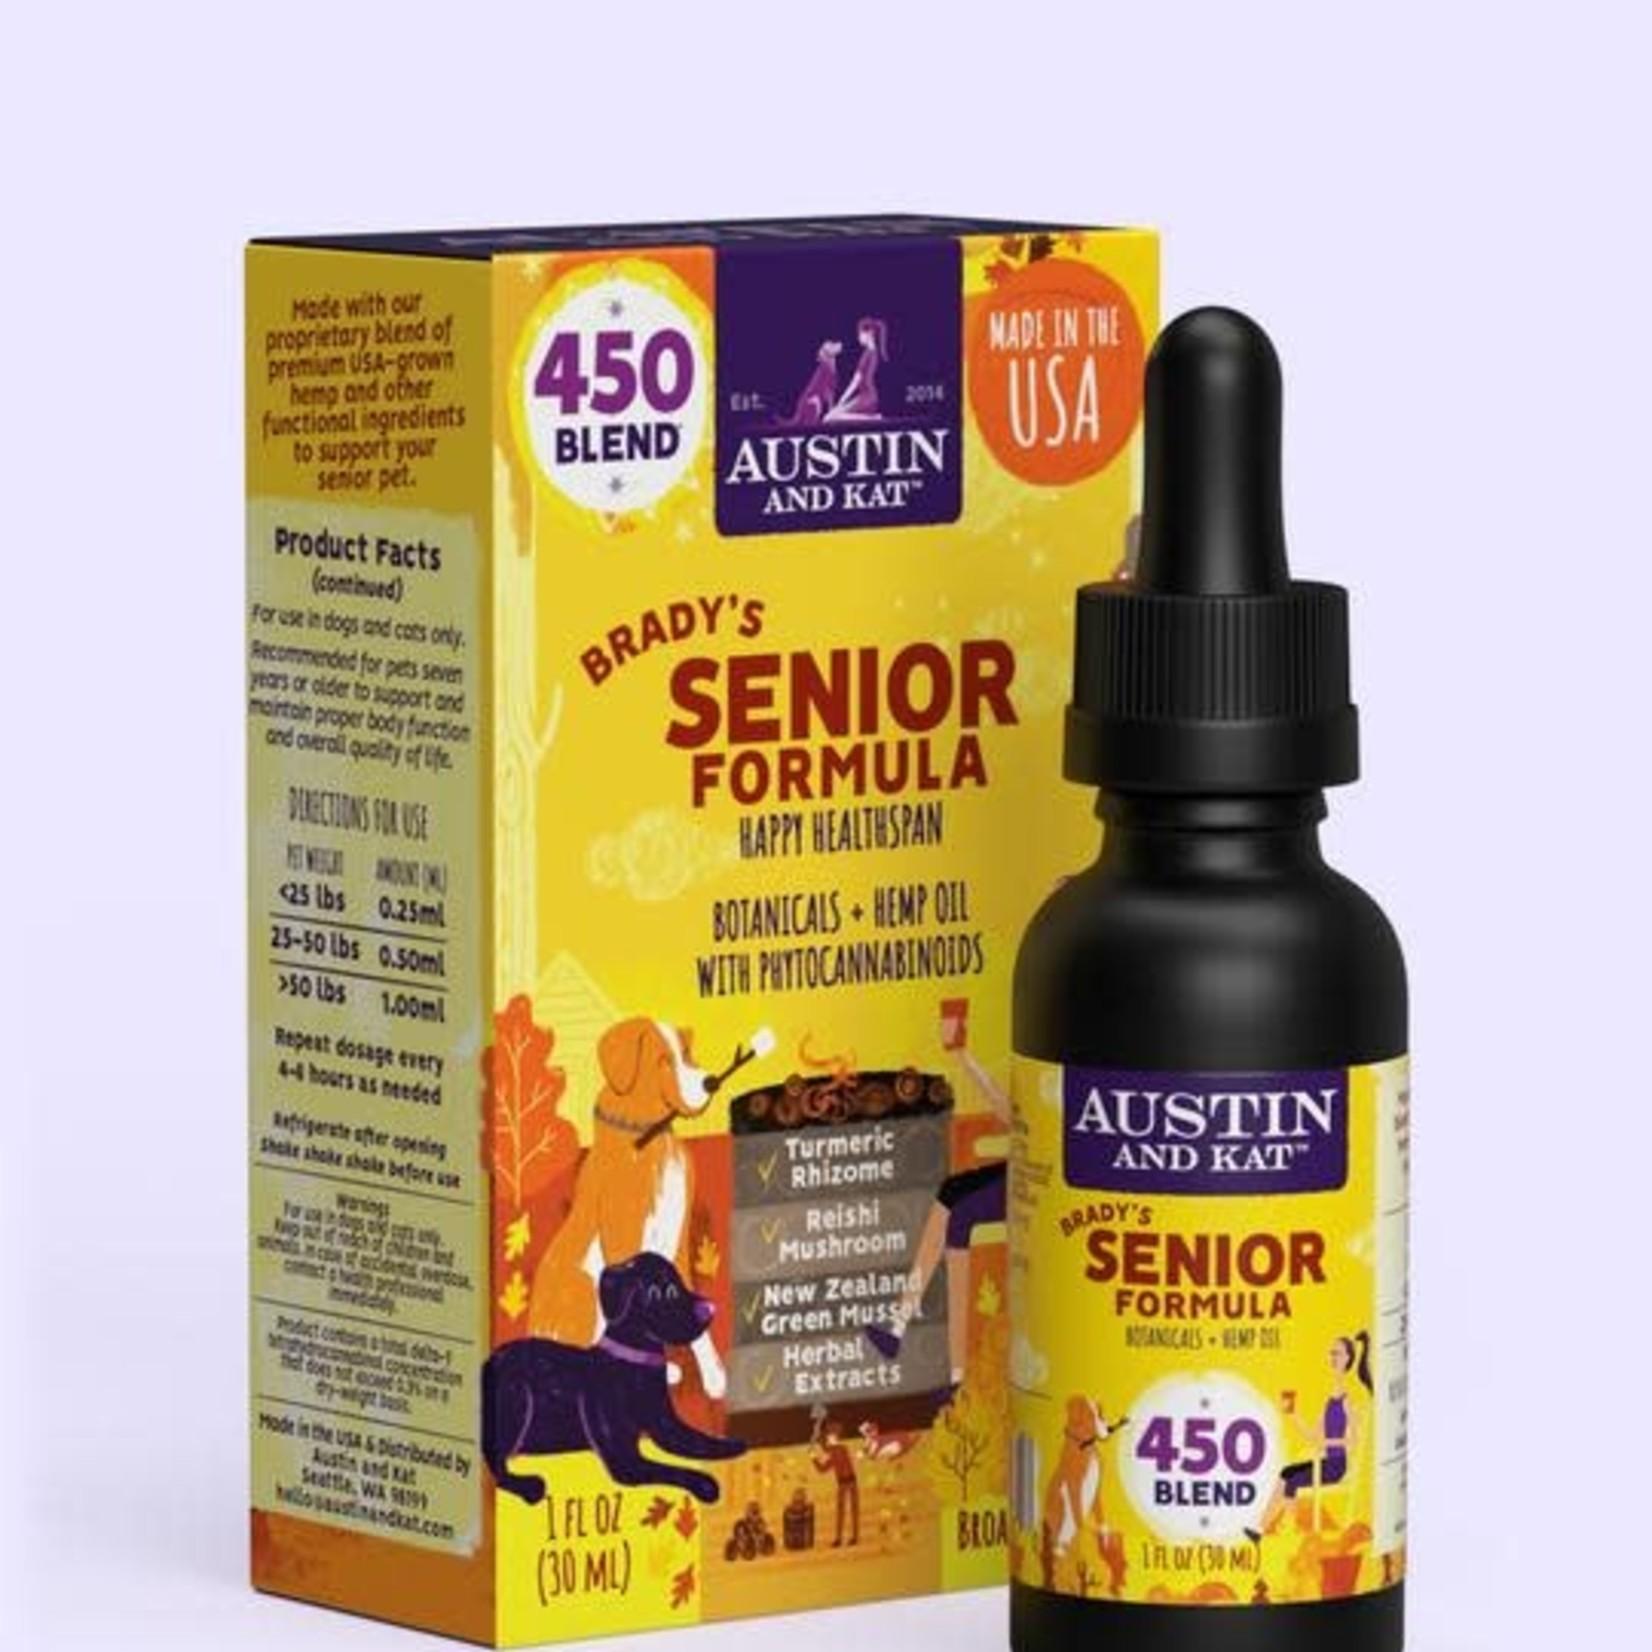 Austin and Kat Austin & Kat Hemp Oil Senior Blend 450 MG